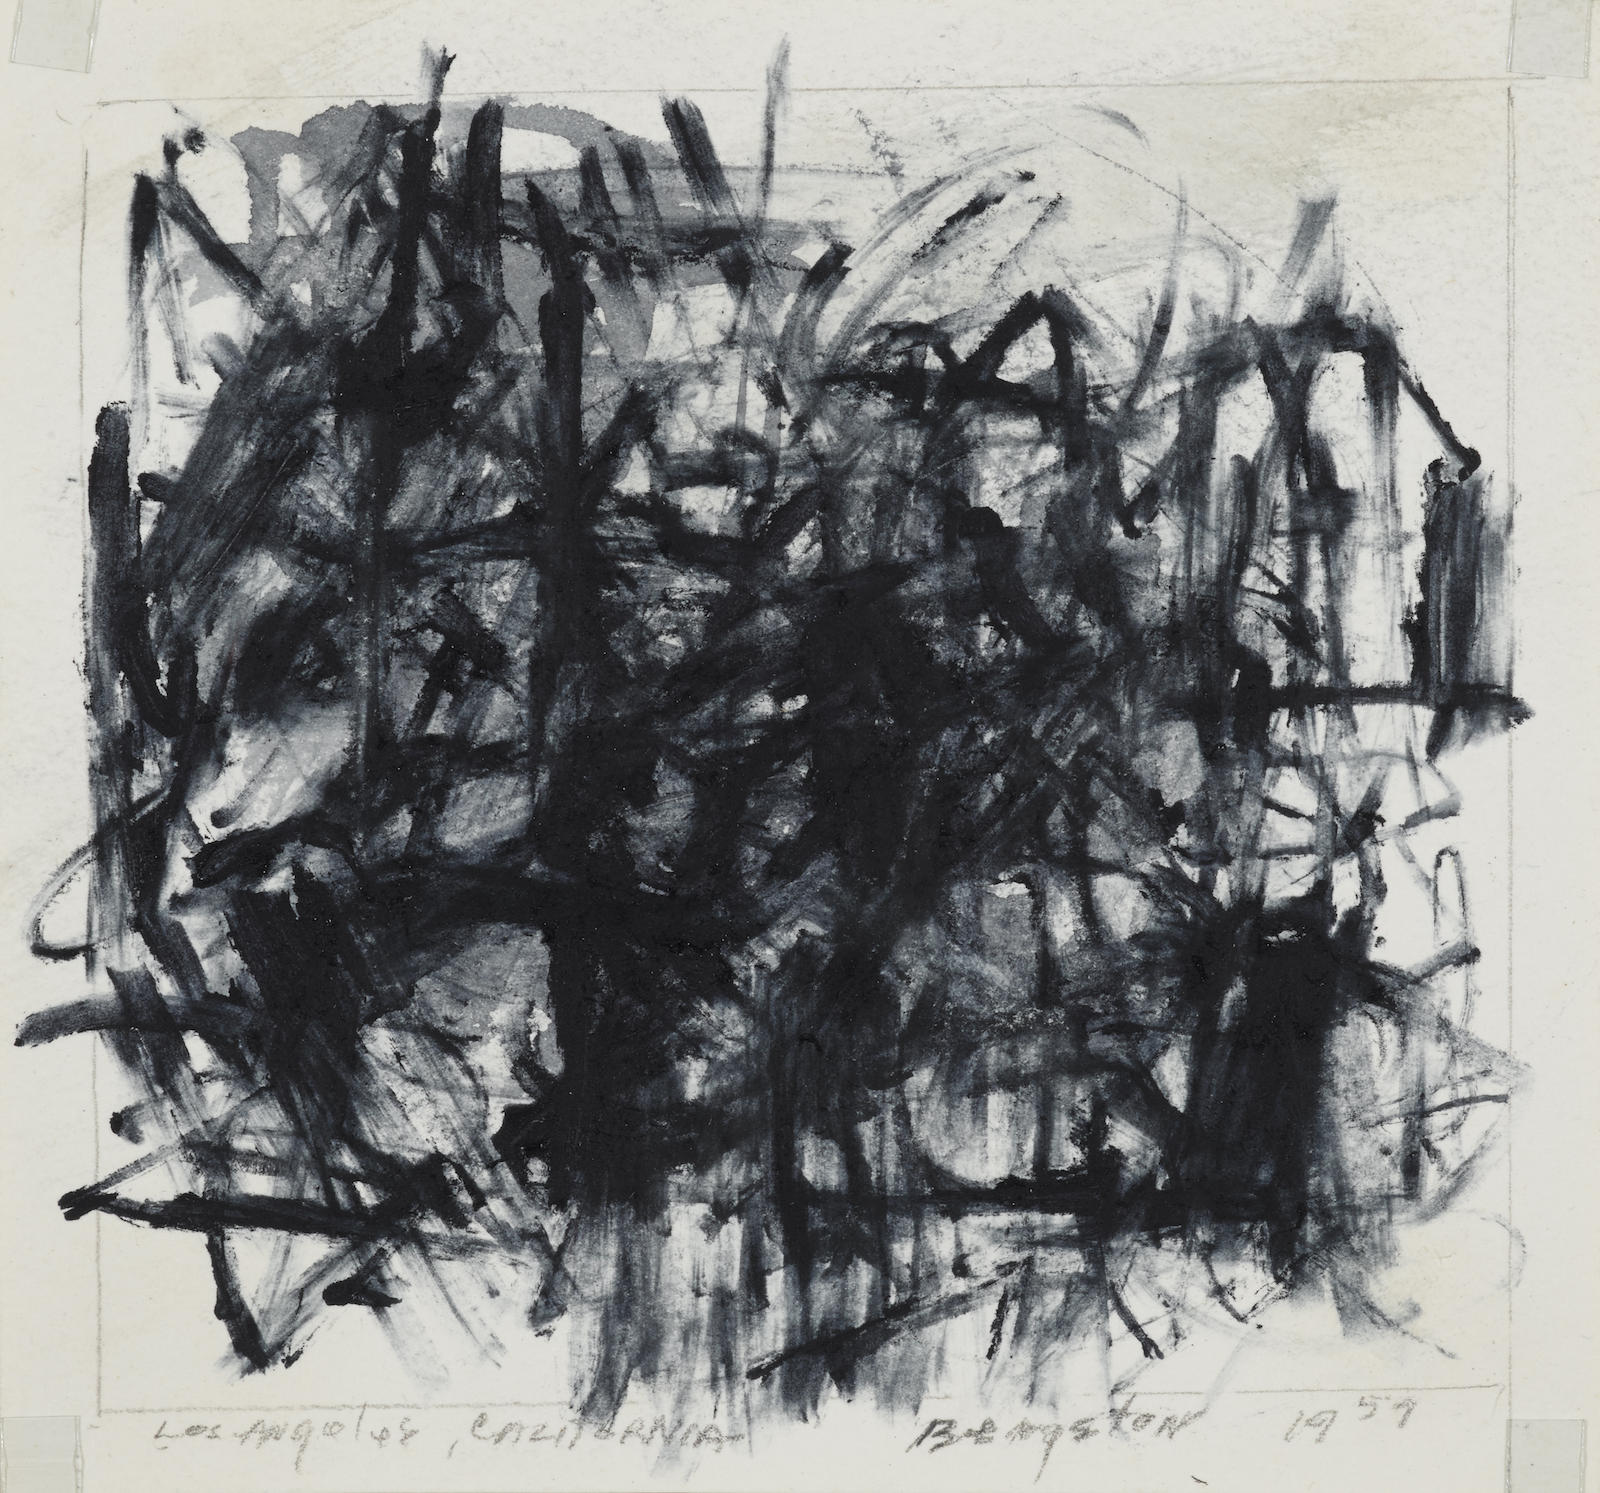 Billy Al Bengston-Untitled-1959